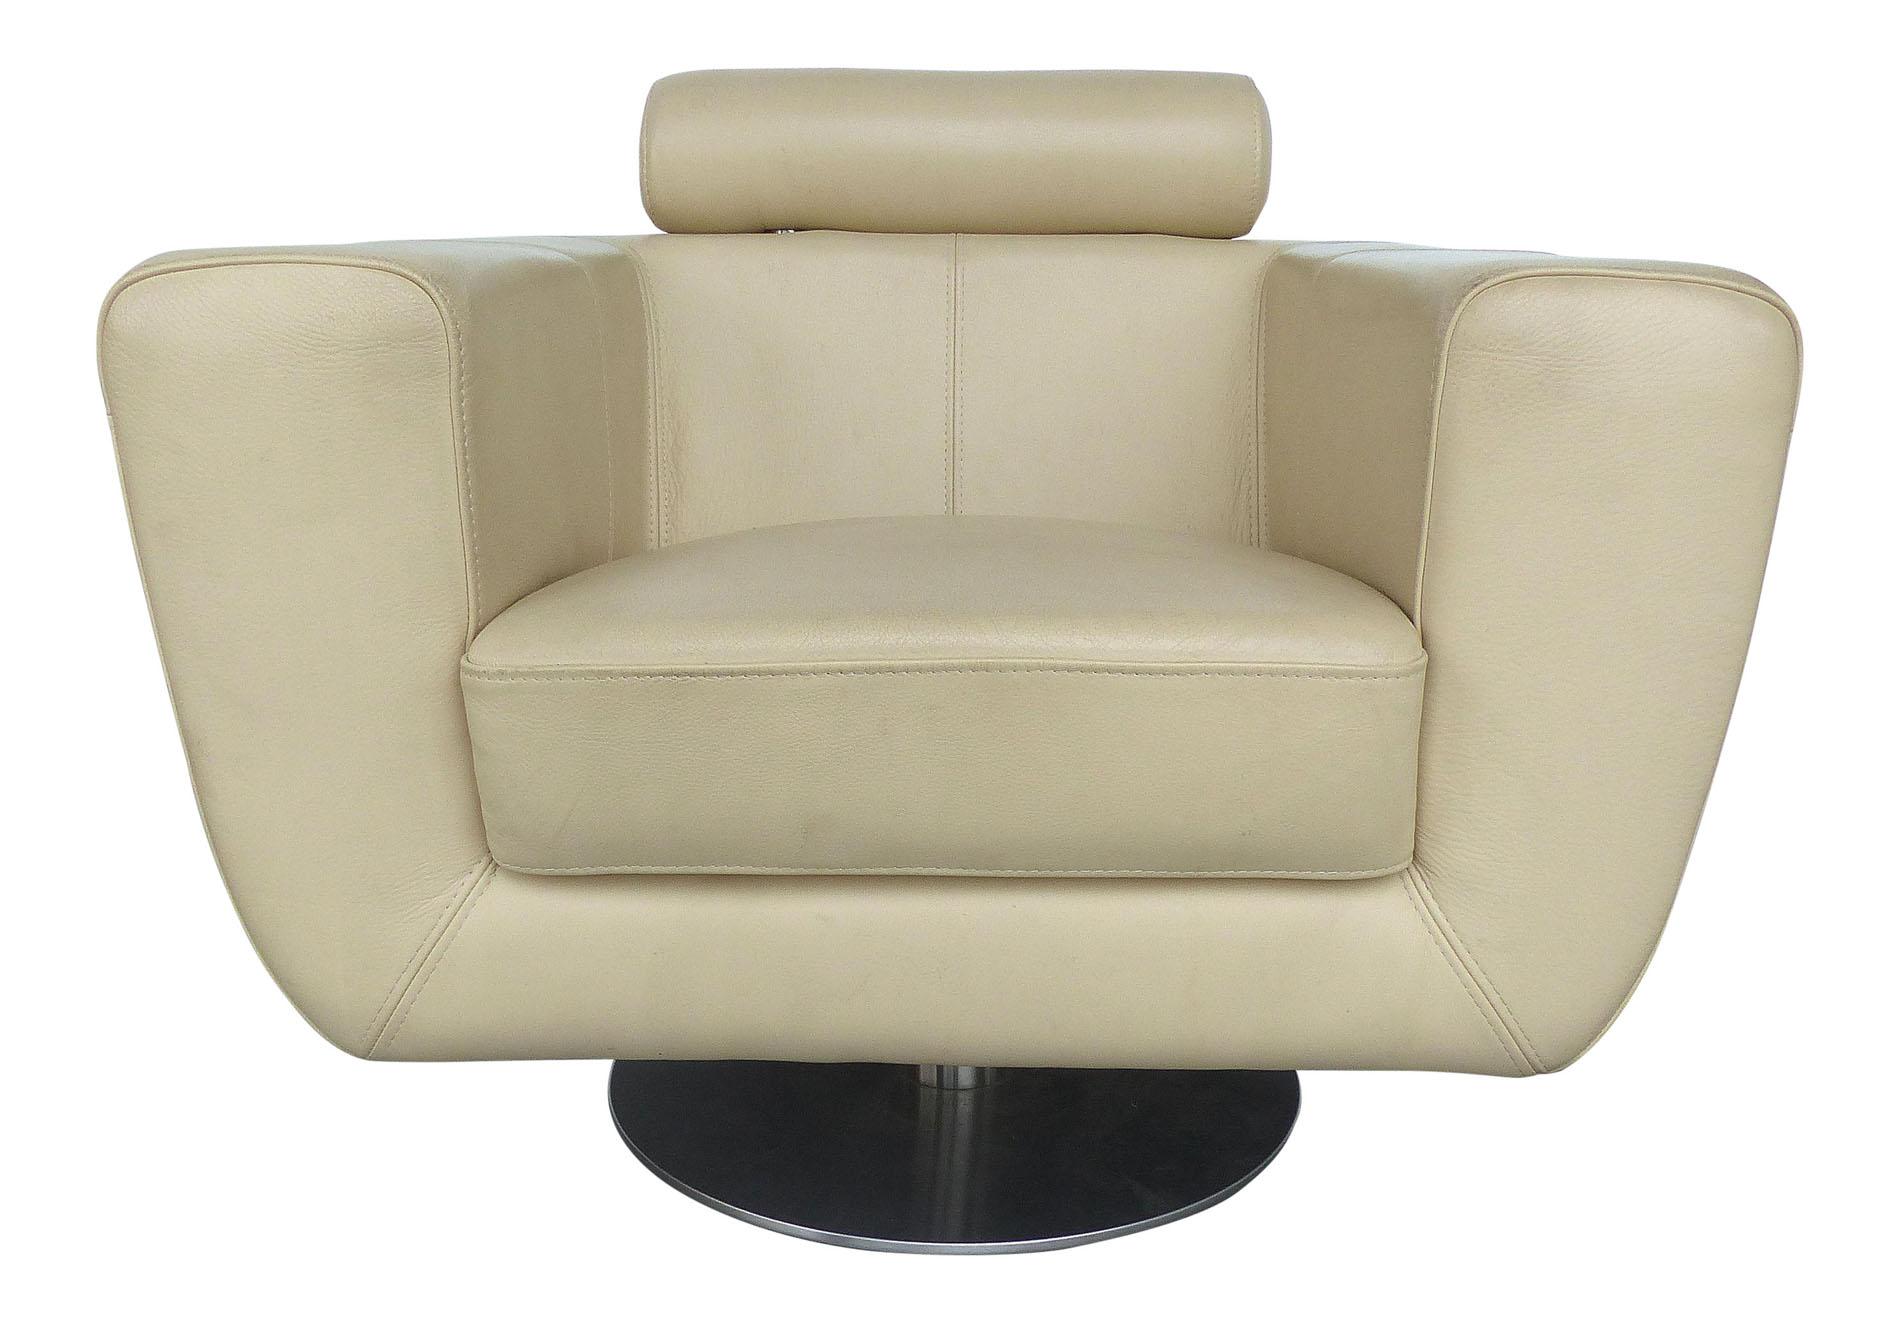 swivel club chair teal faux fur saucer modern beige leather modernism